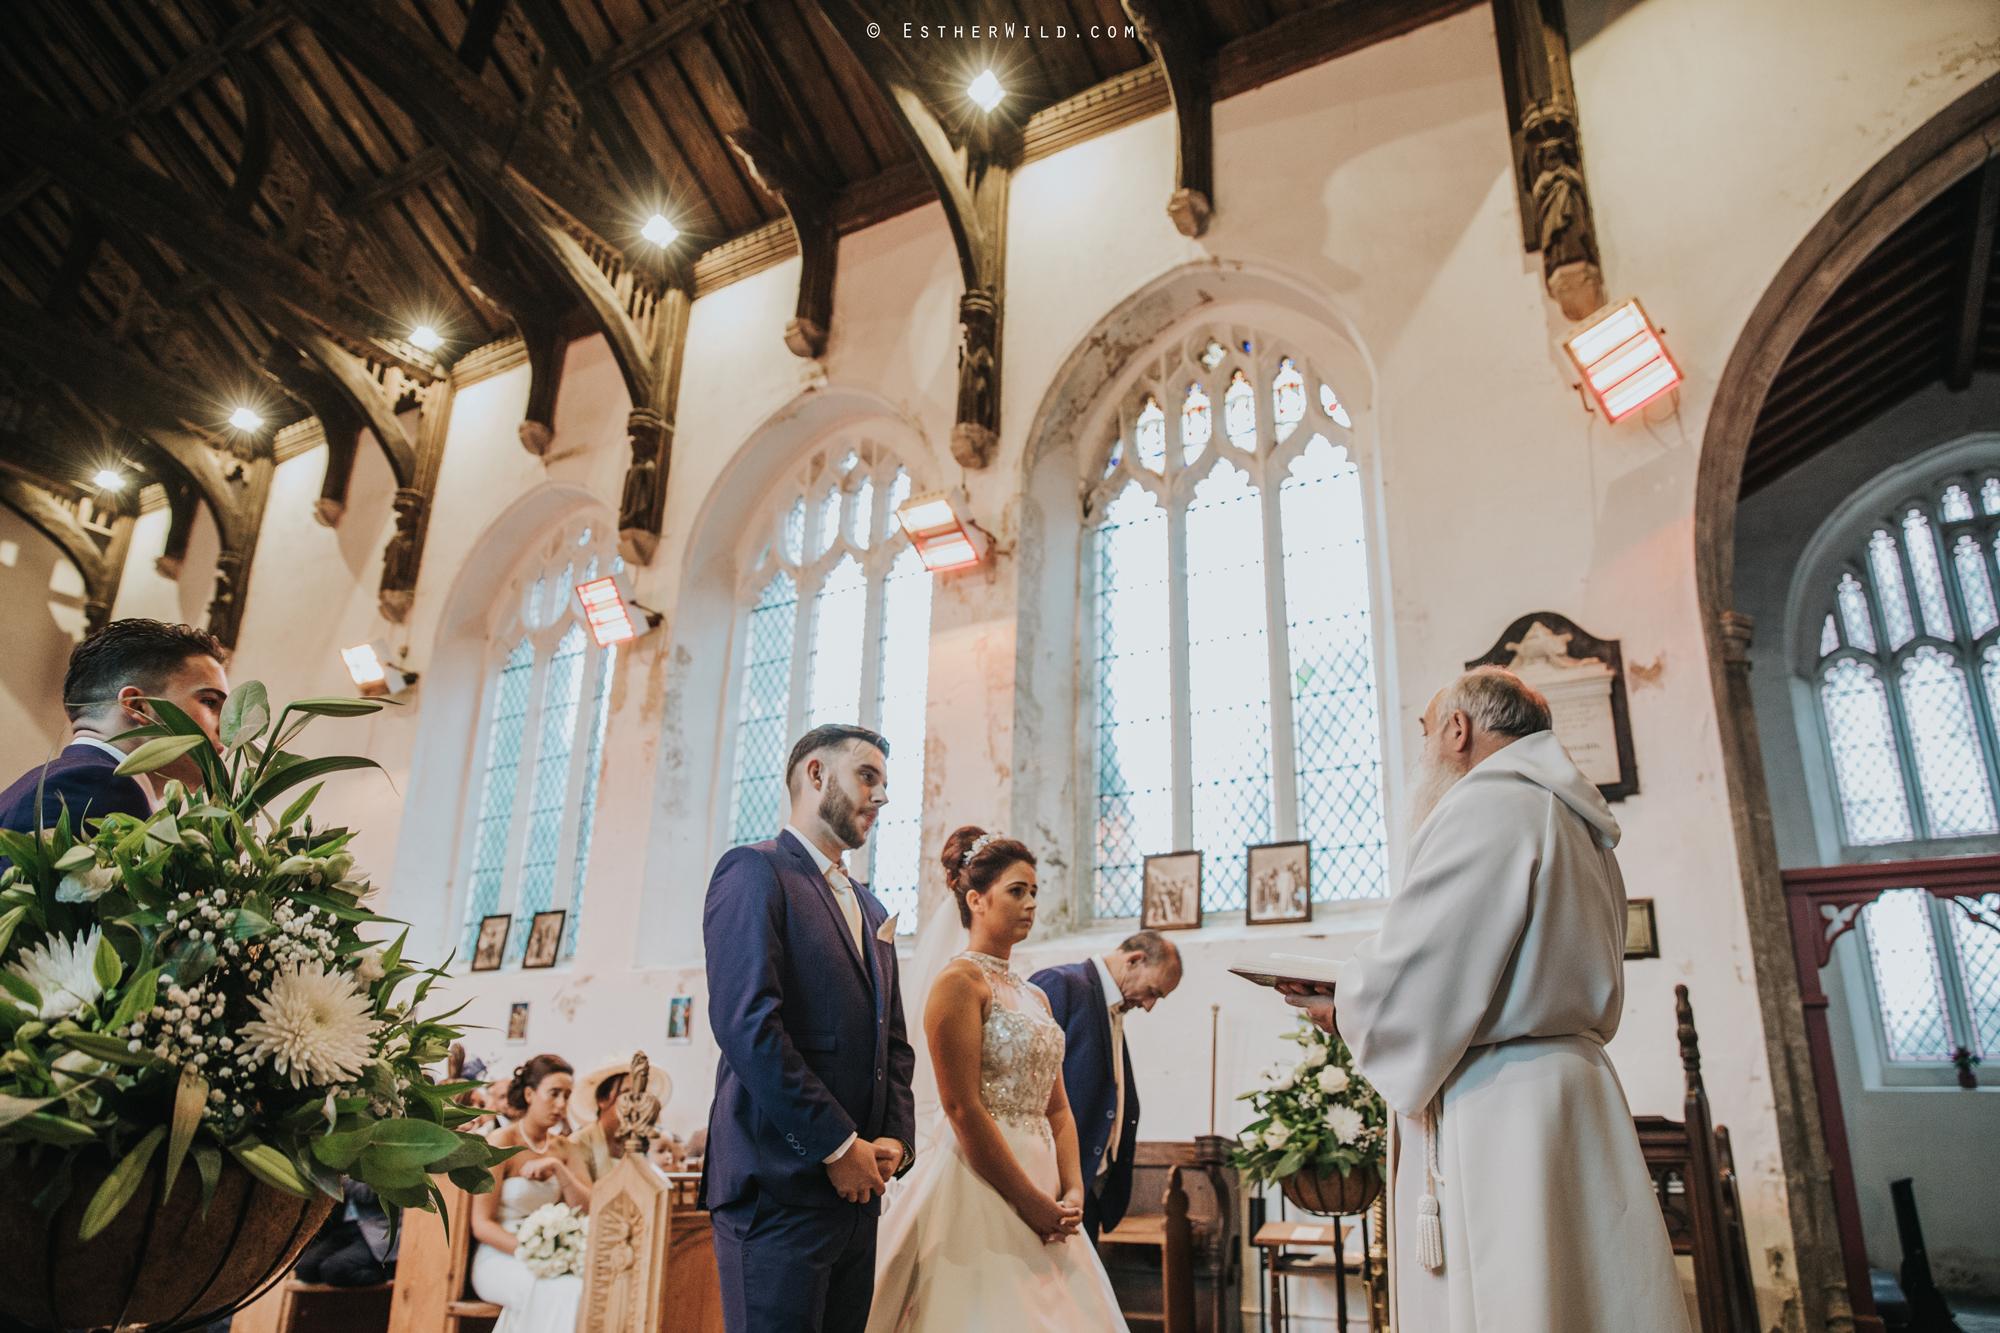 1117_West_Lynn_Church_Wedding_Norfolk_Photographer_Esther_Wild_IMG_7675.jpg